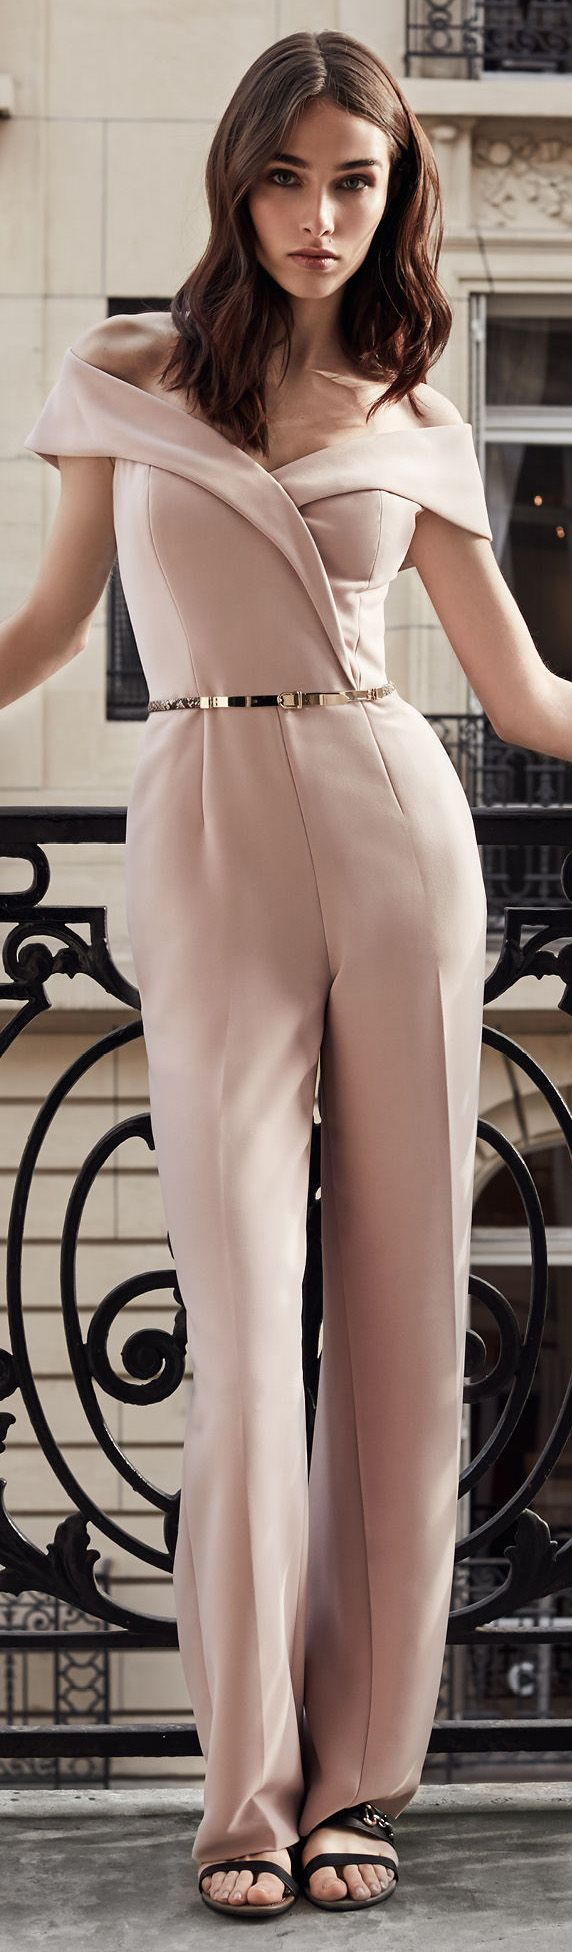 Adina Off-The-Shoulder Jumpsuit in Pink Linen